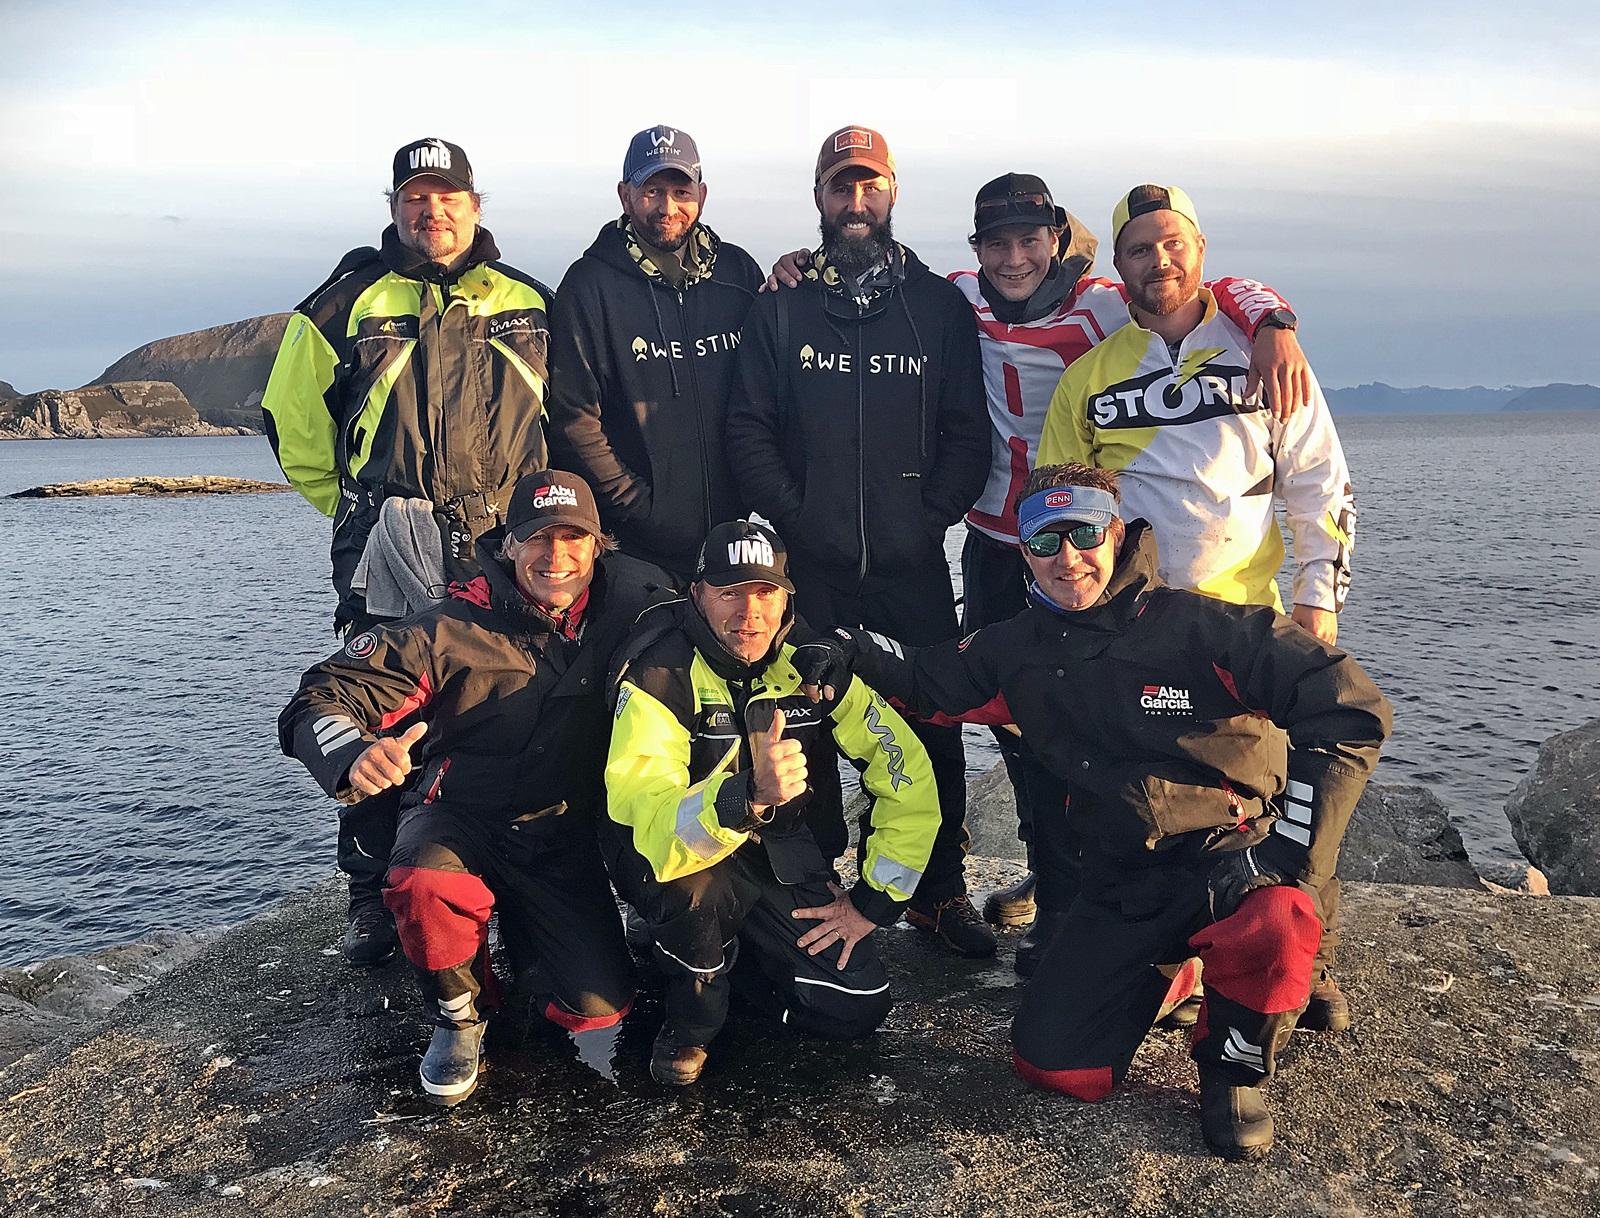 Deltagerne i Havfiskebattlen